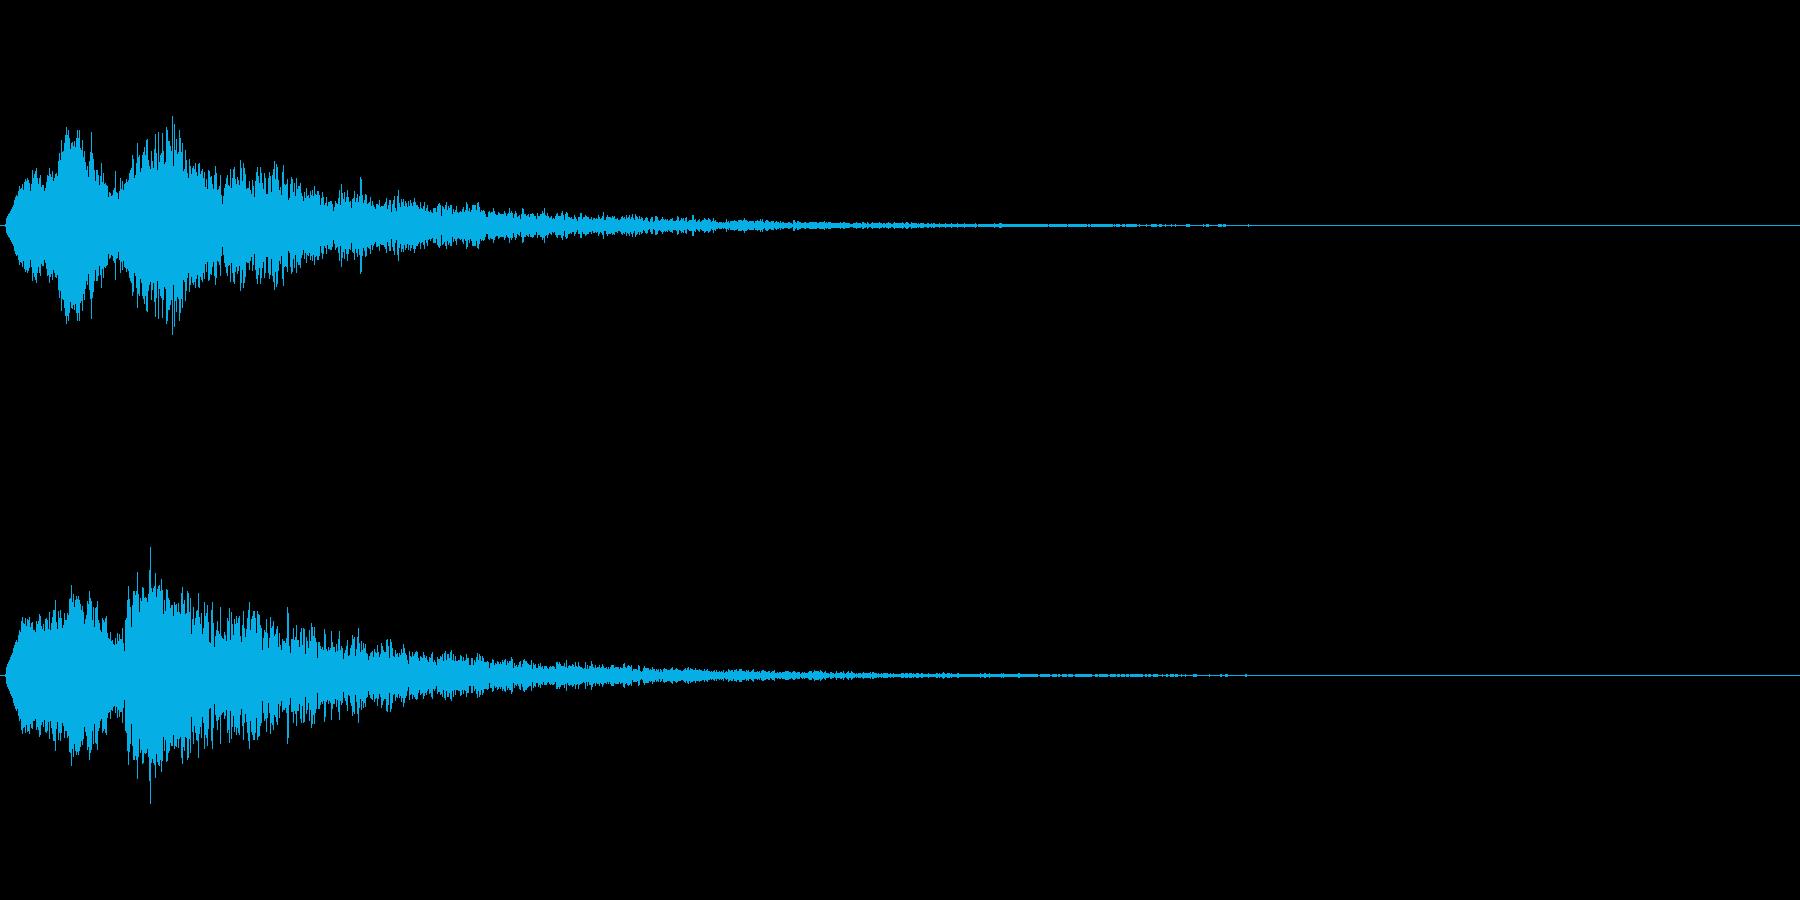 Vox 不気味な鳴き声 ホラーSE 7の再生済みの波形